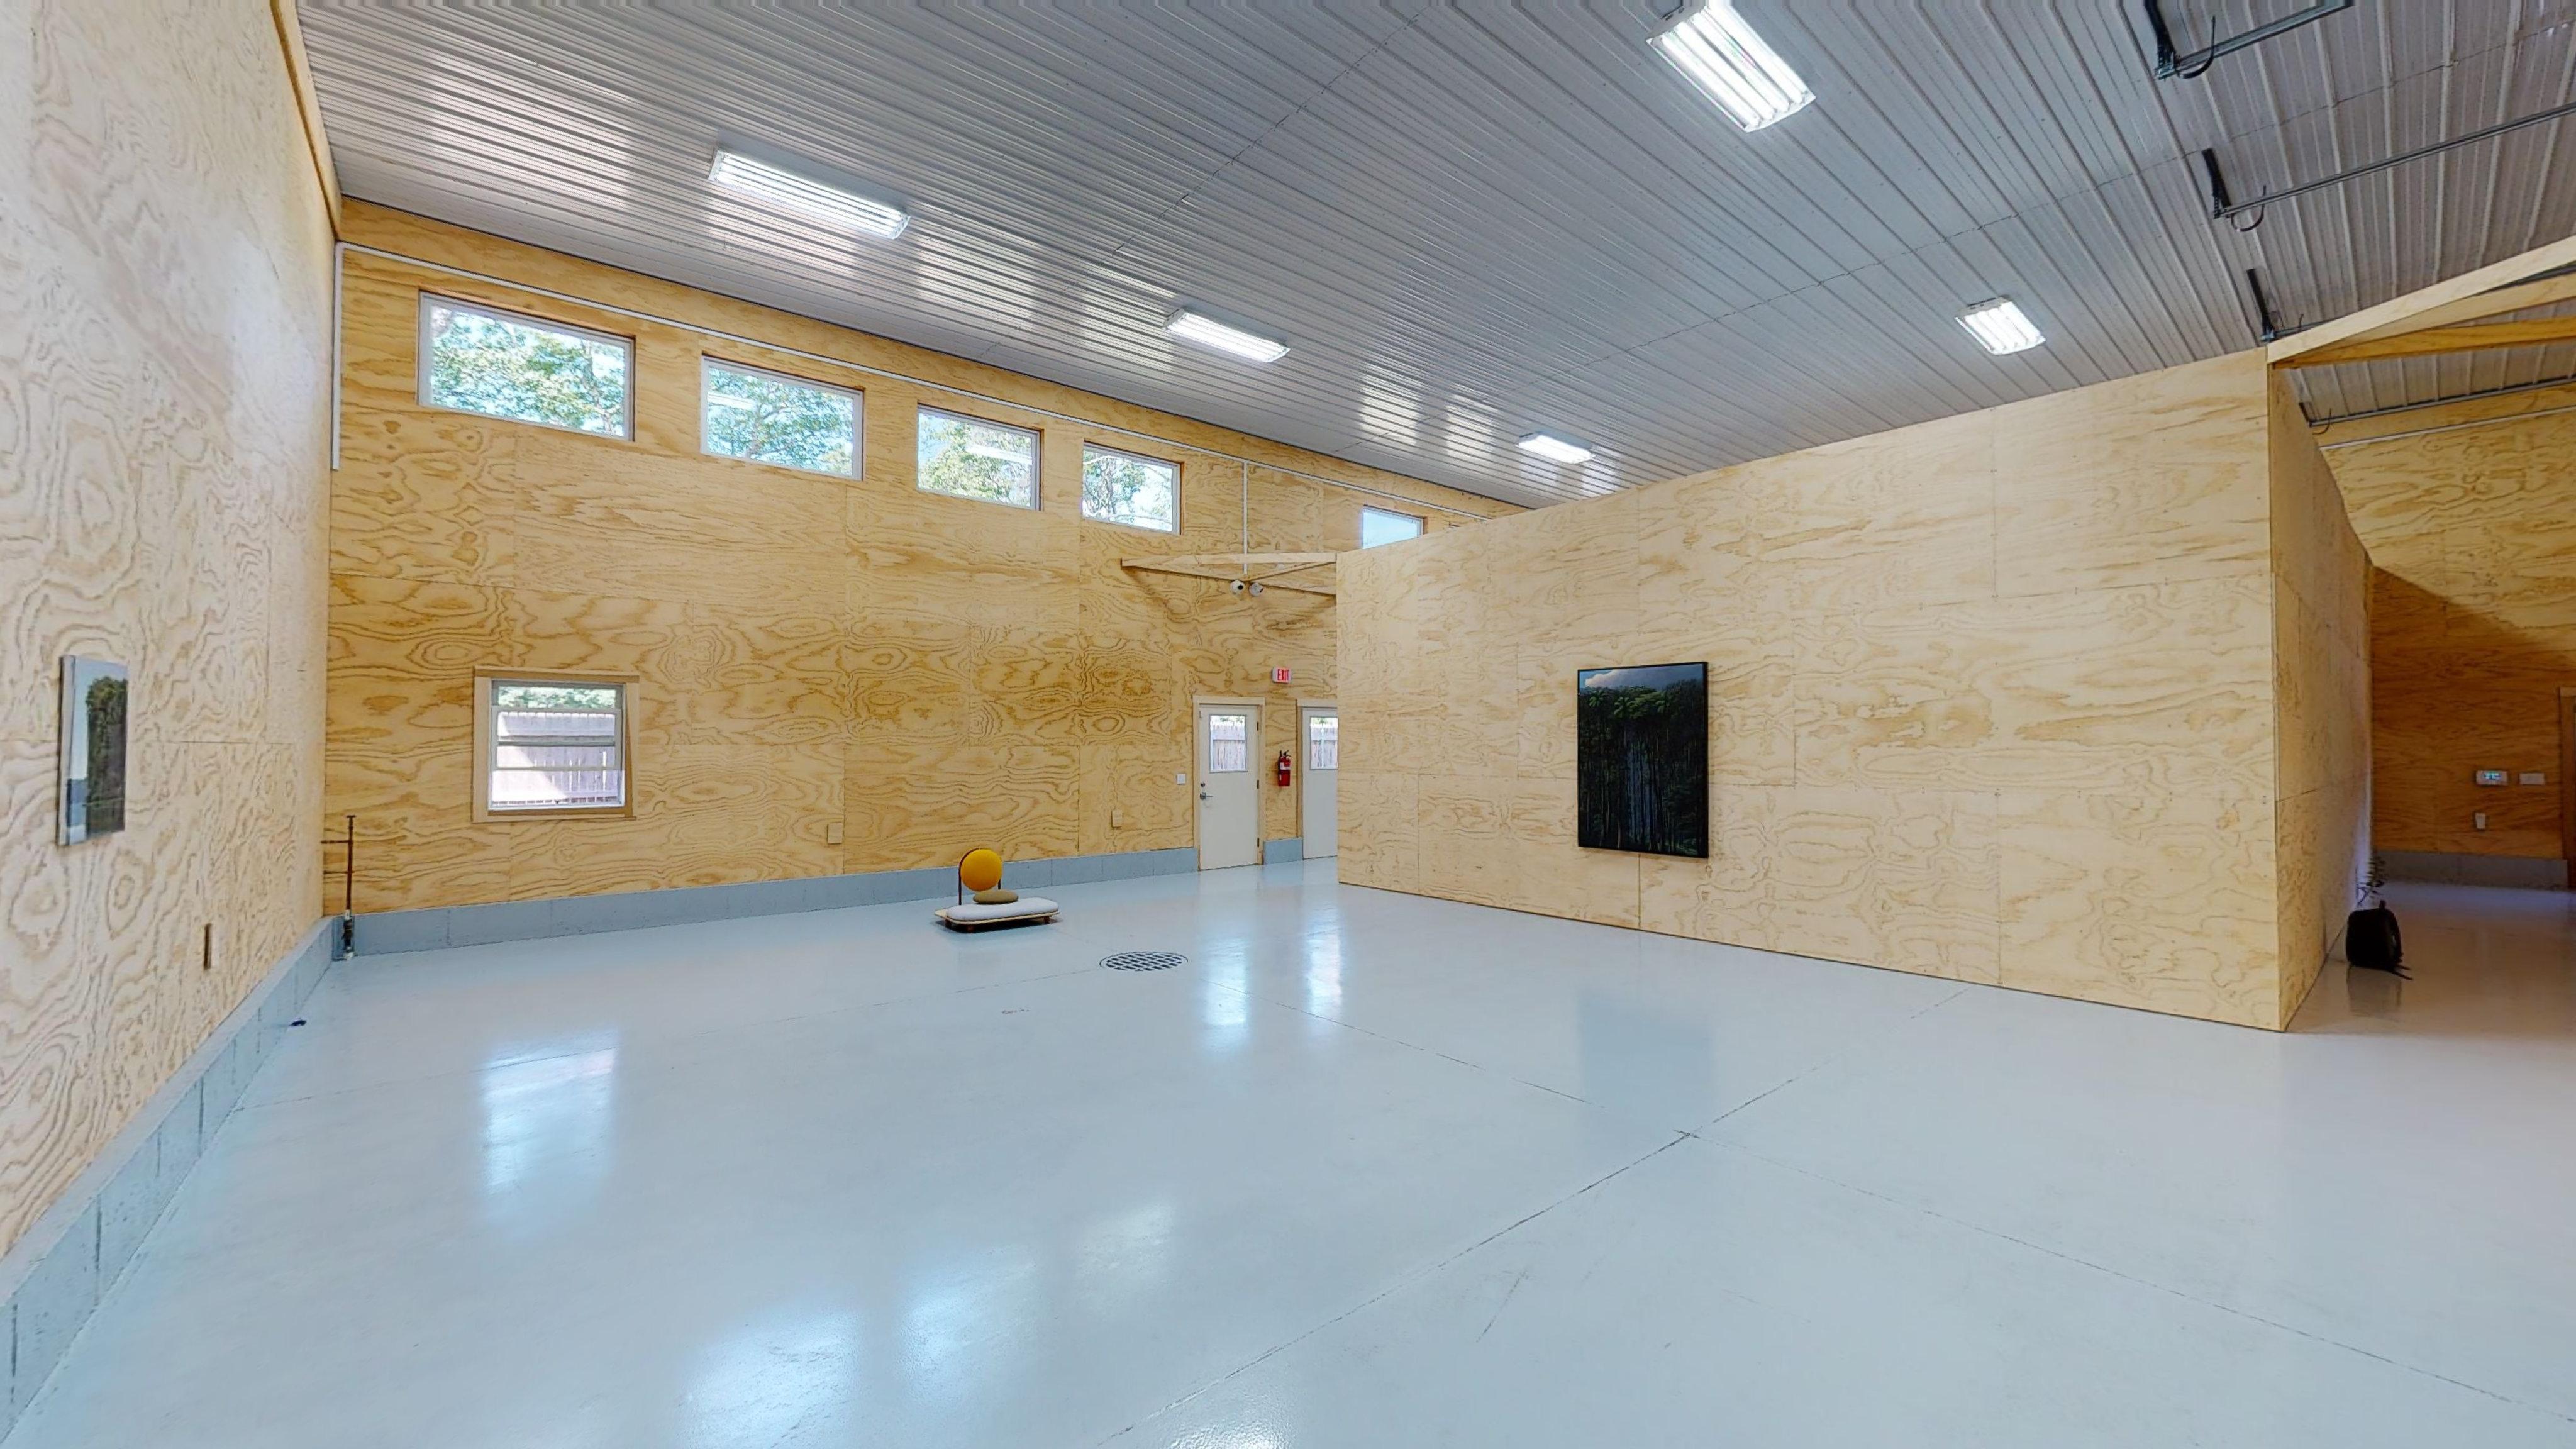 Alone Gallery, Wainscott